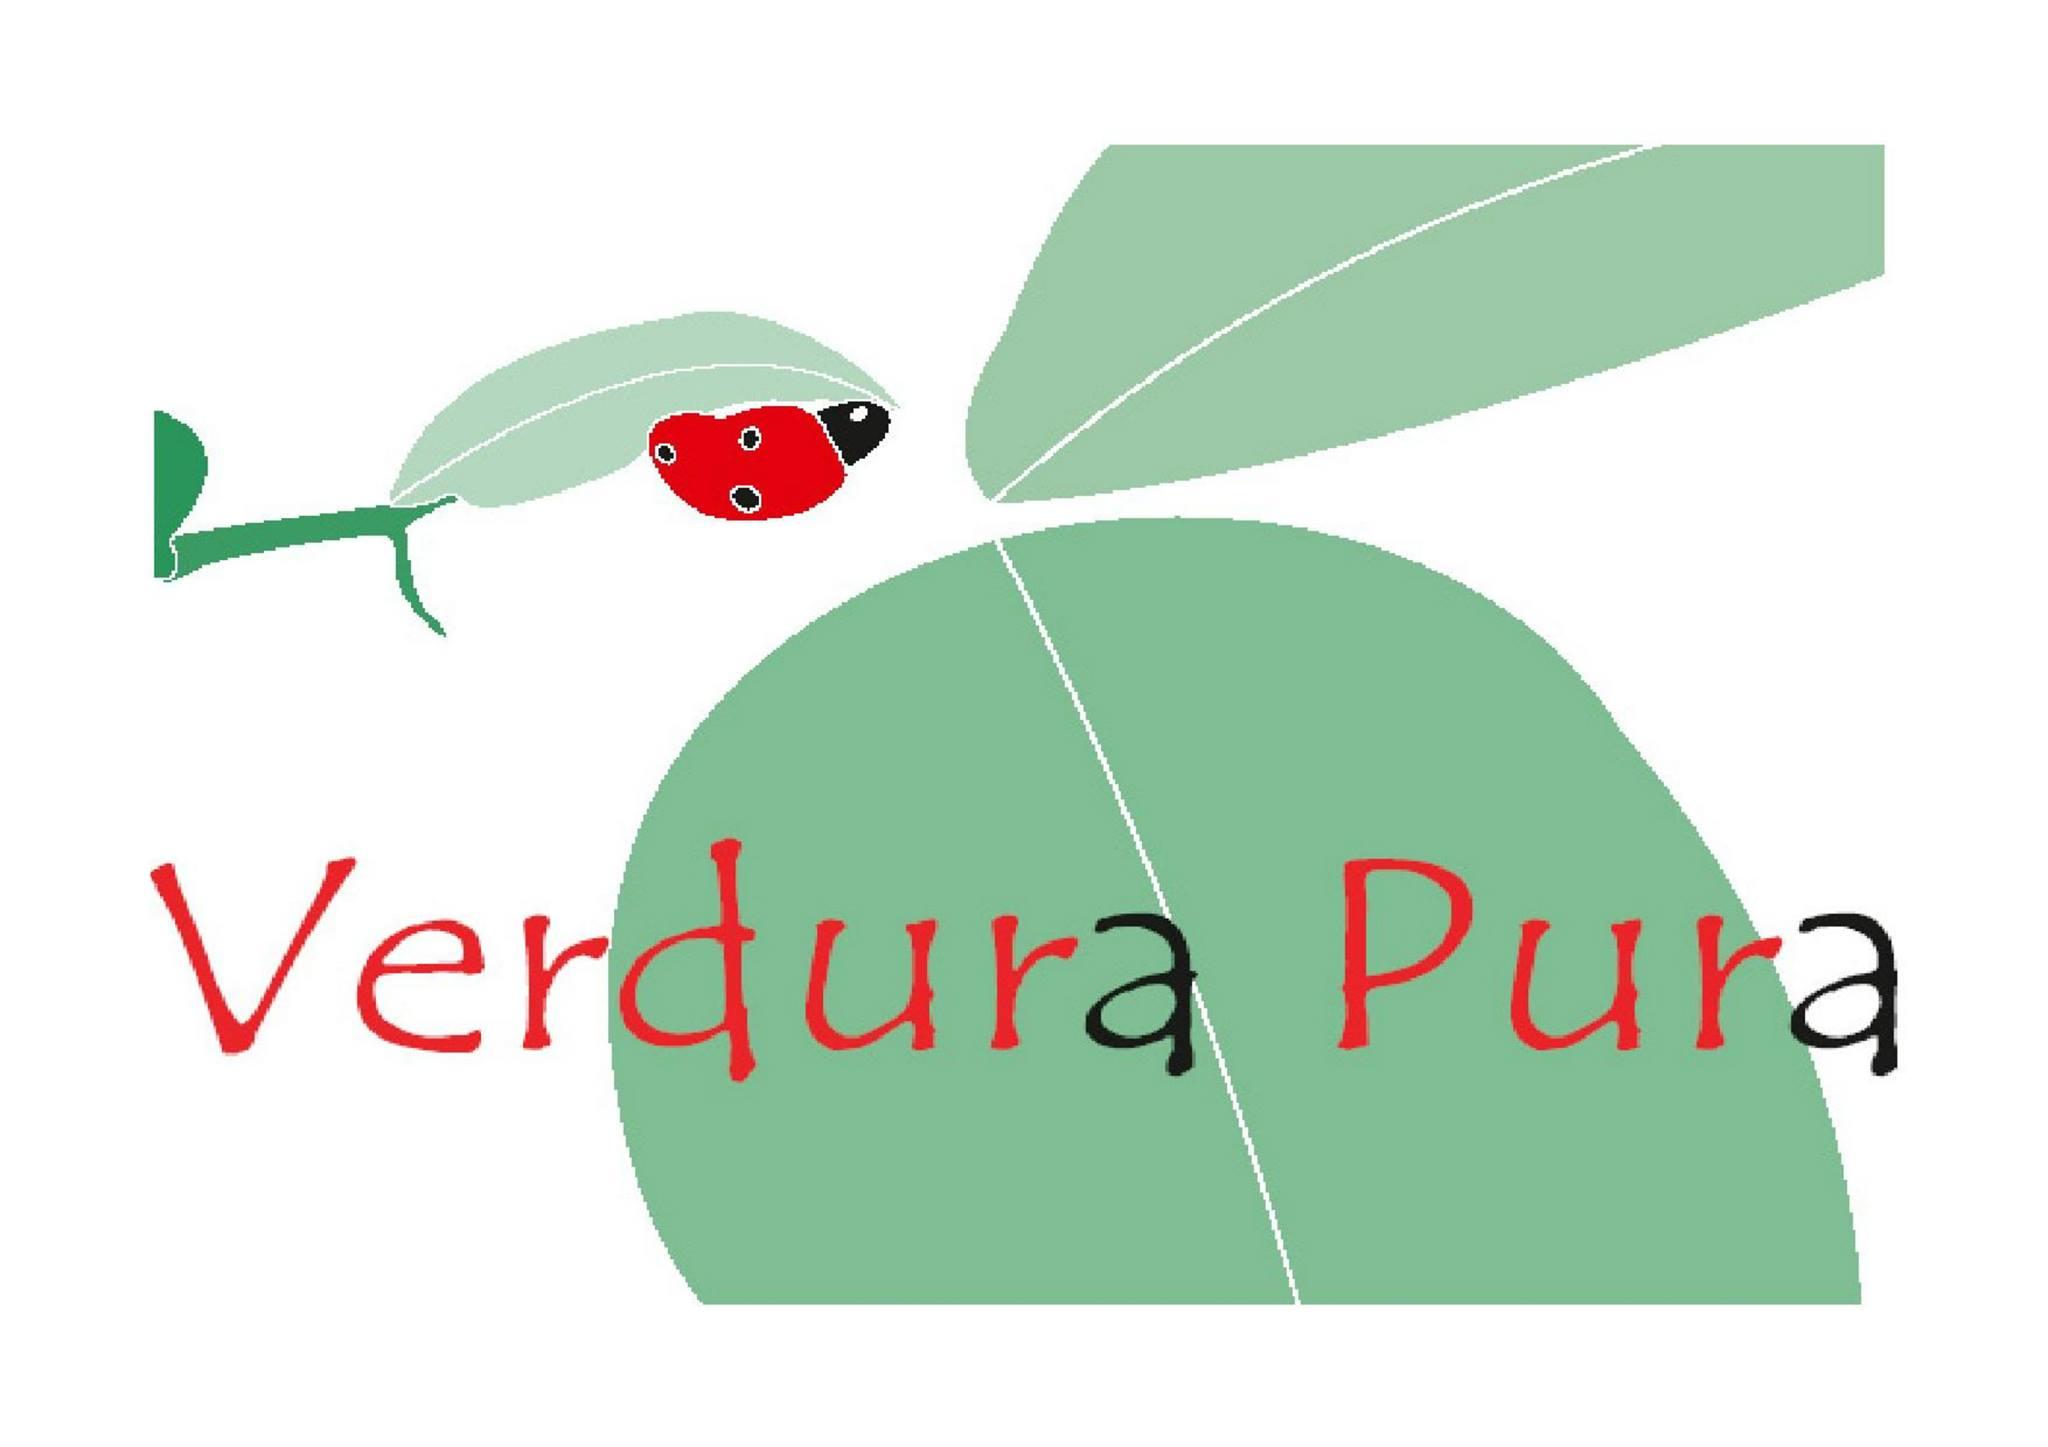 VERDURA PURA